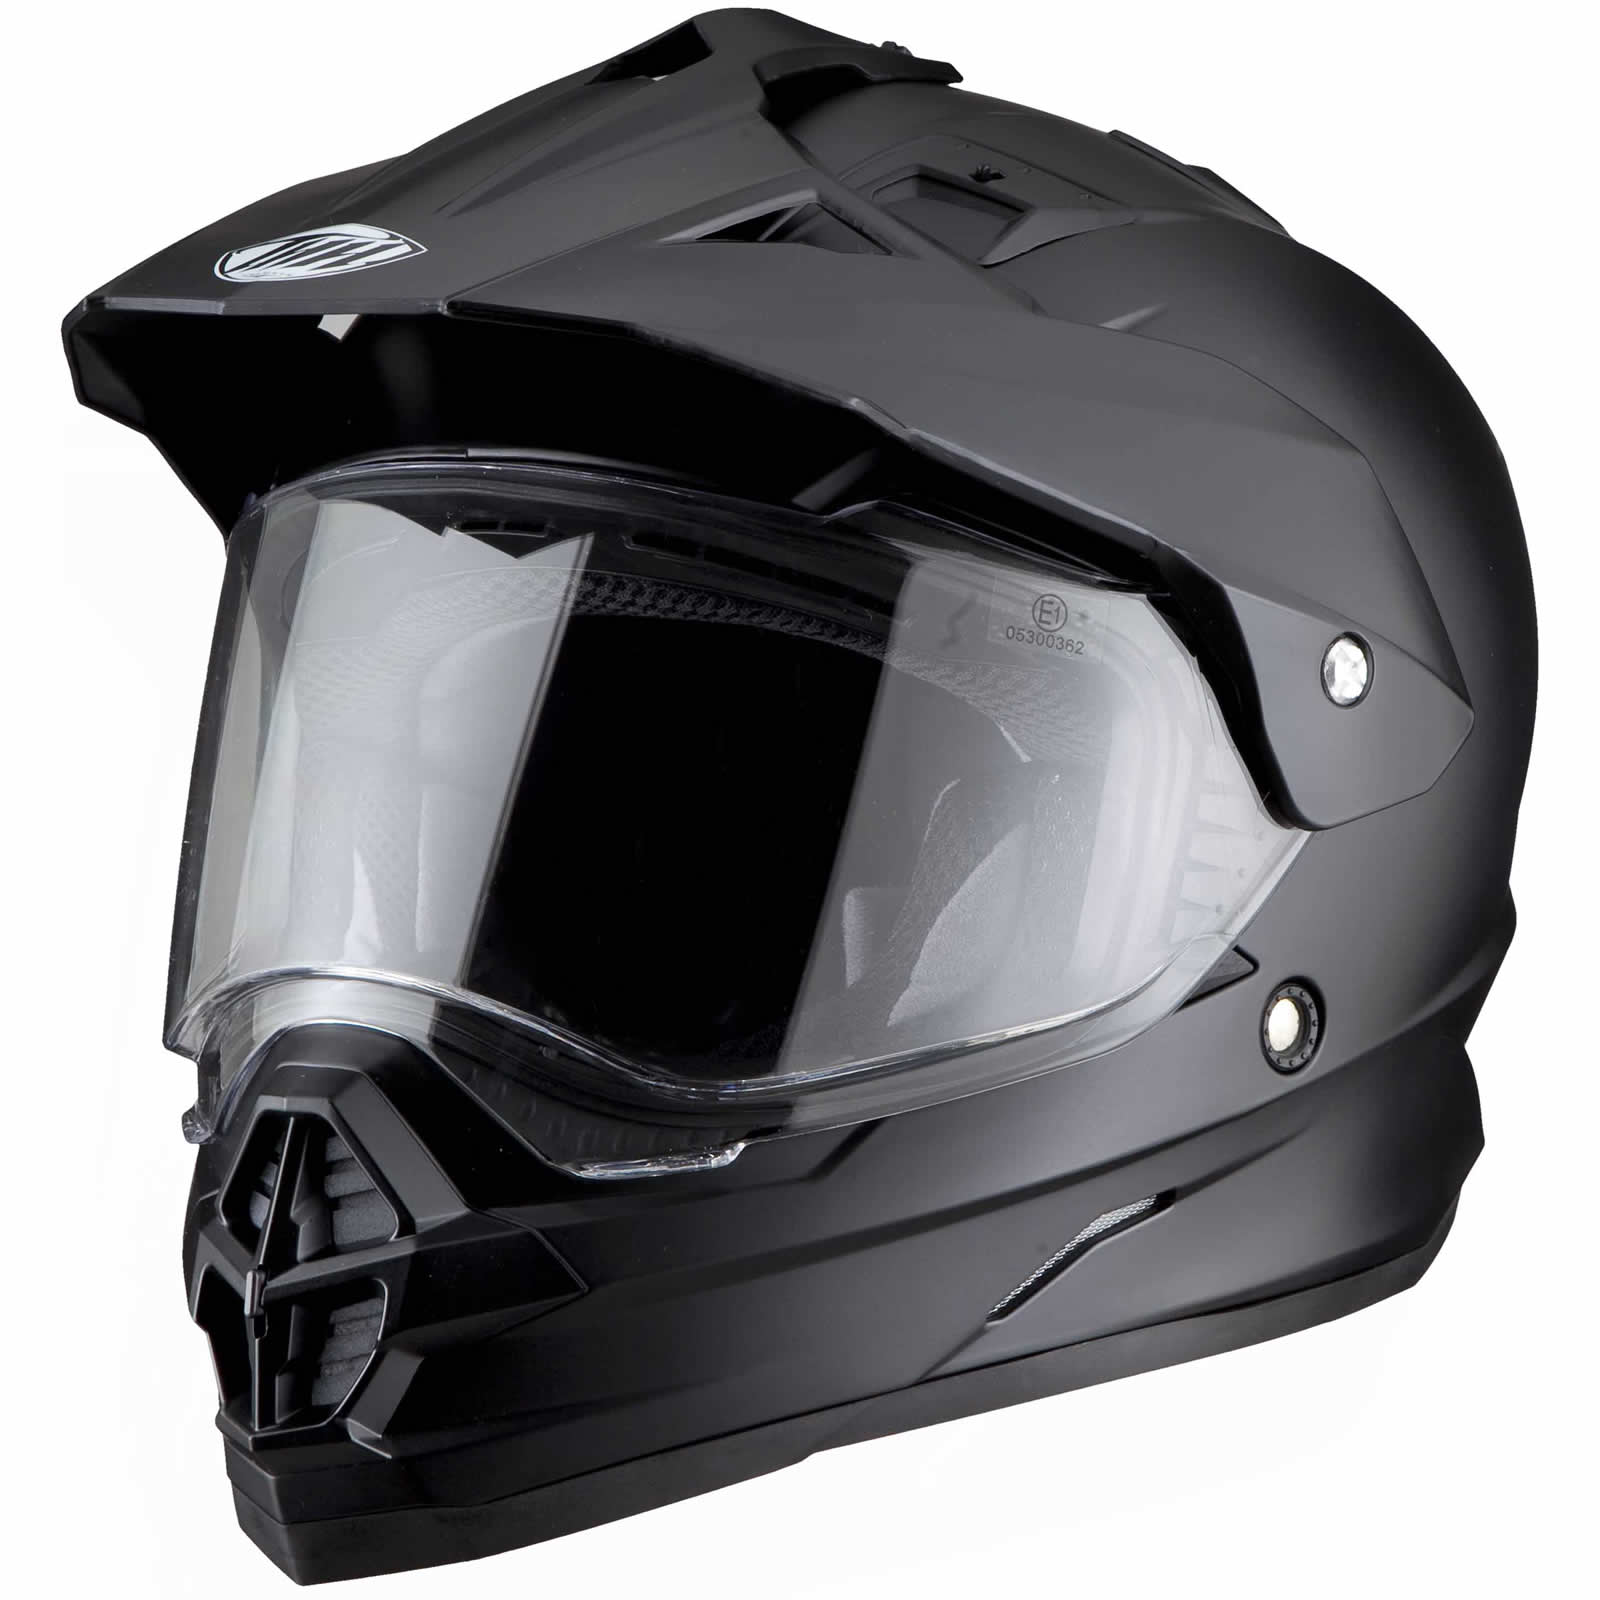 Dirt Bike Helmet With Visor >> Thh Tx 26 Dual Sport Mx Enduro Off Road Motocross Motorcycle Helmet